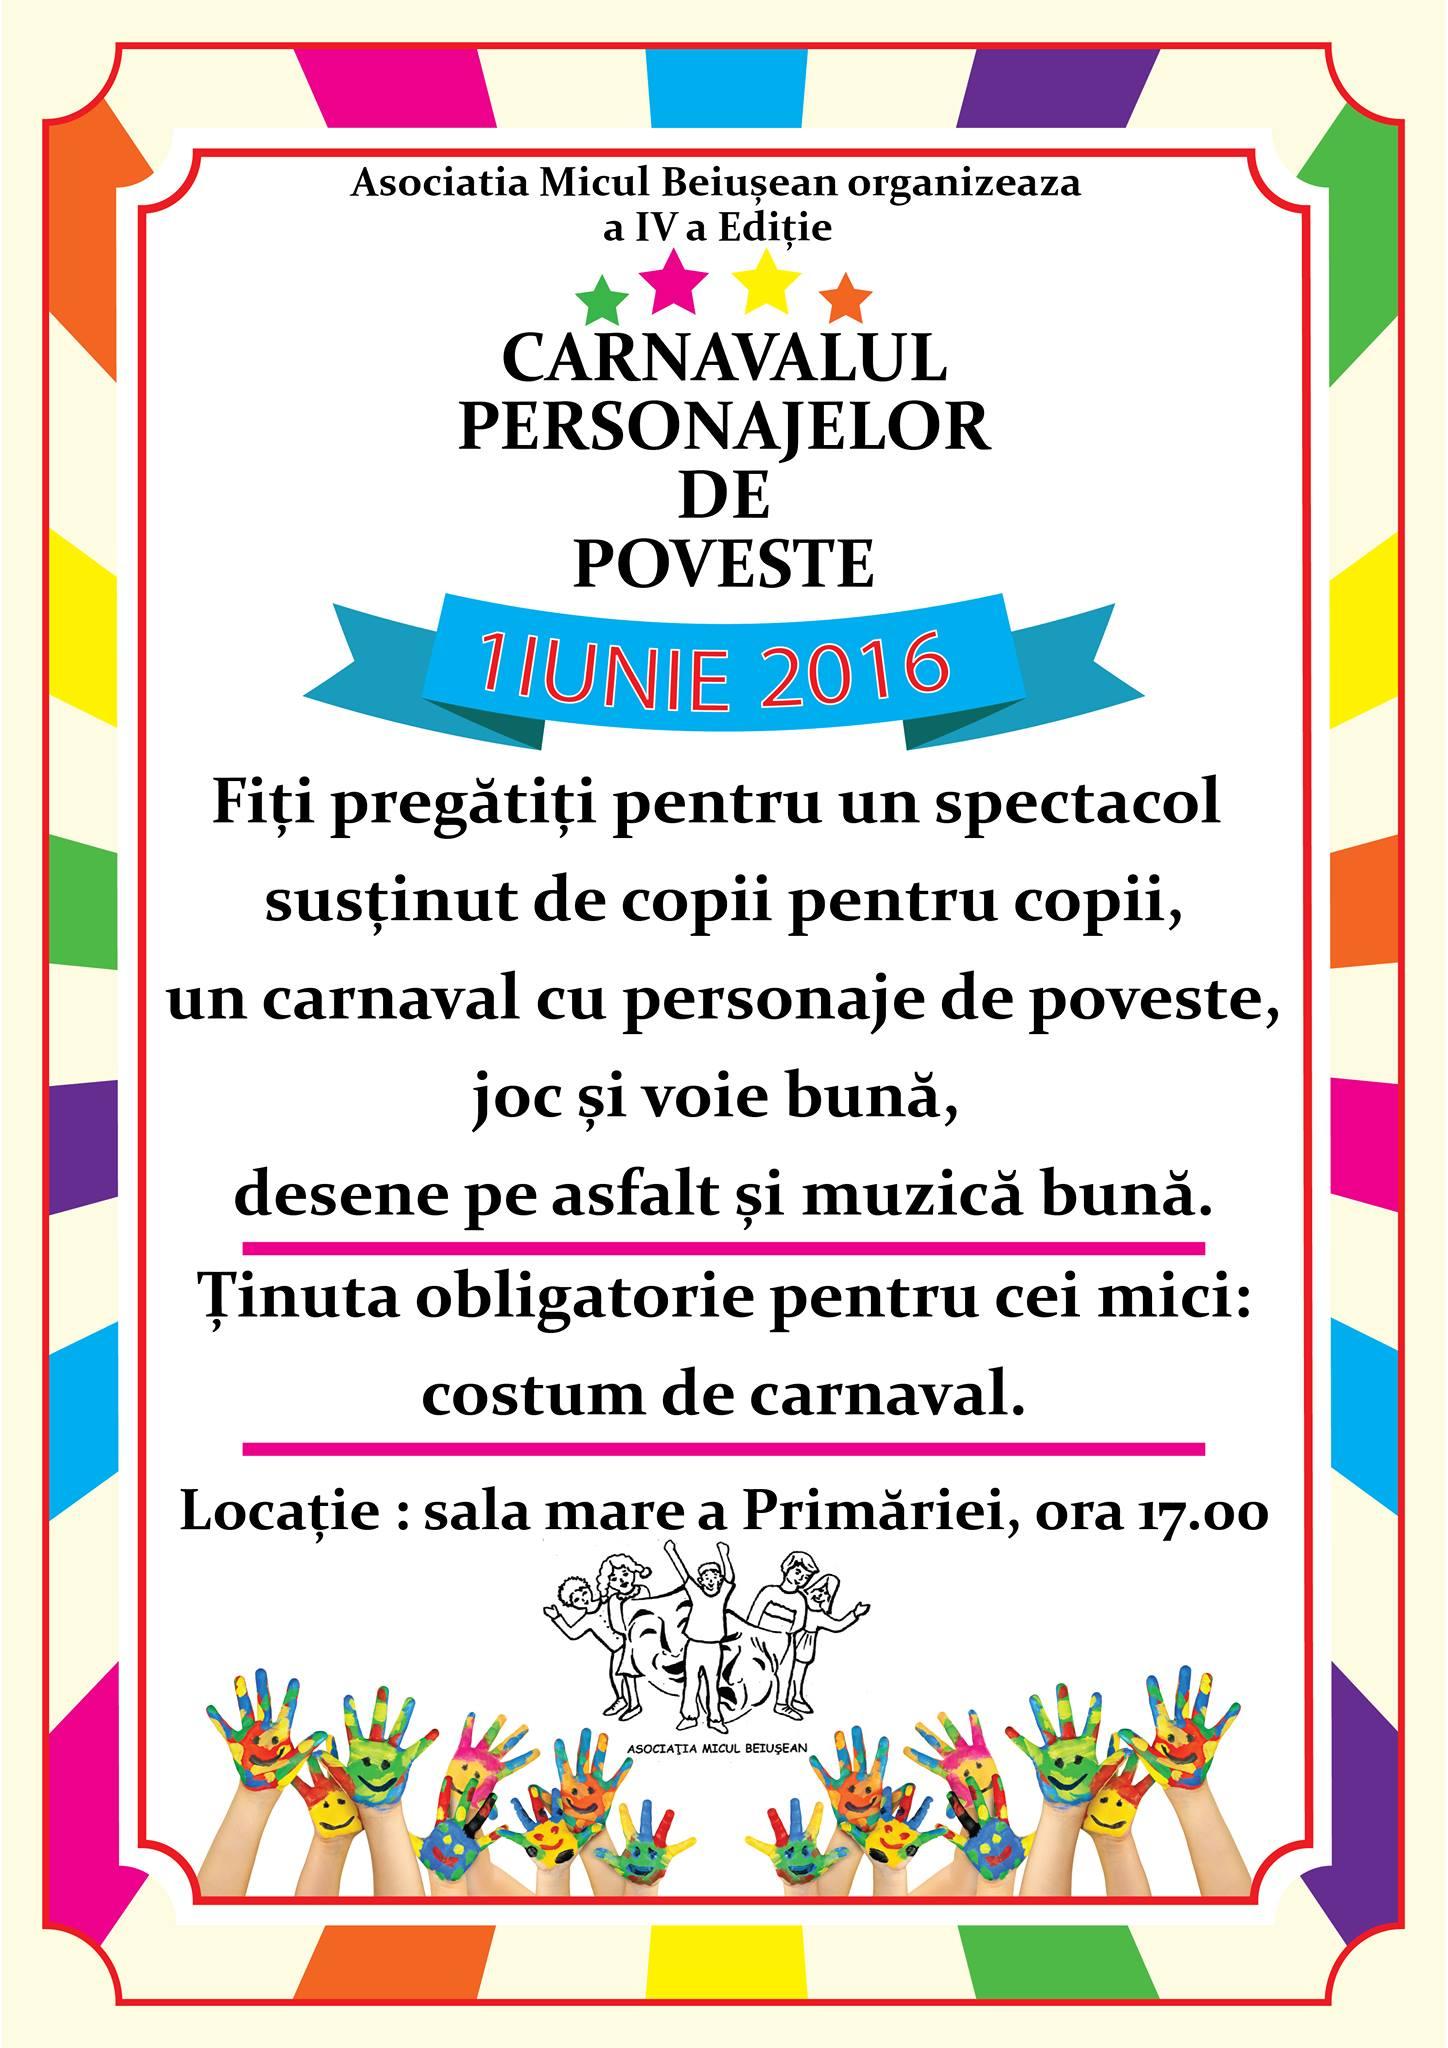 Carnavalul Personajelor de Poveste, ediția a 4-a, 1 iunie 2016